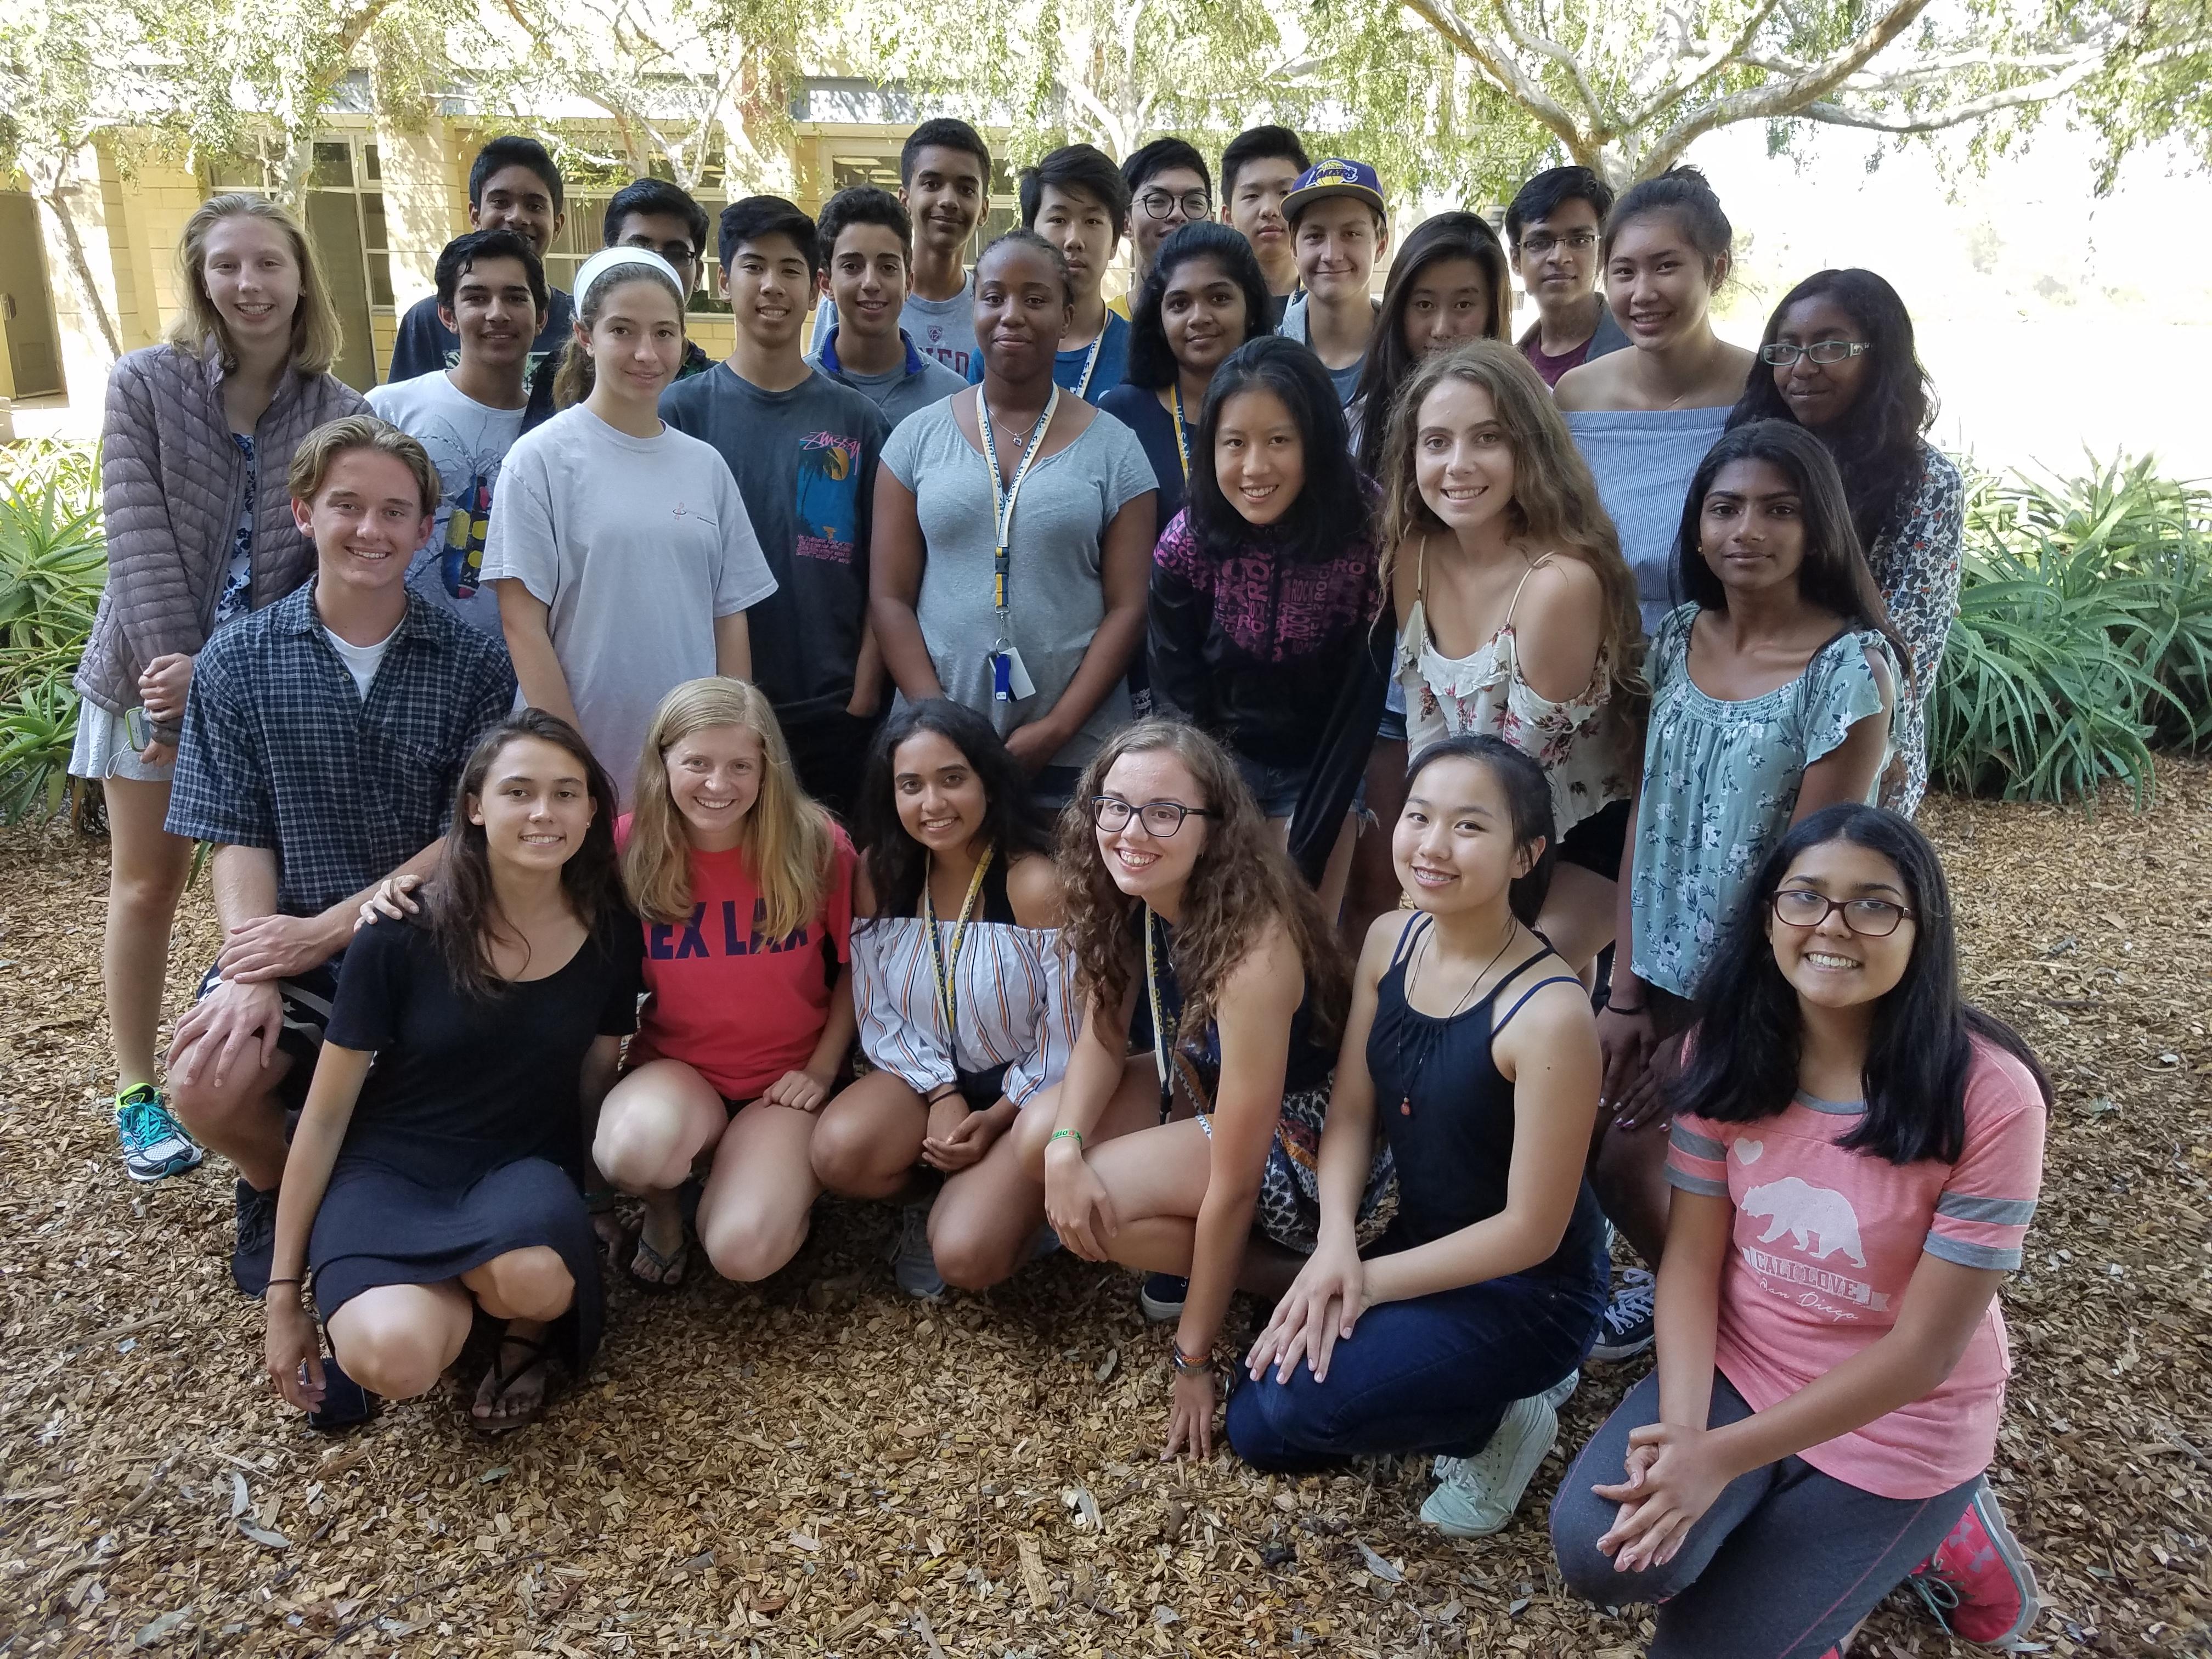 Summer Program - Gifted | Rosetta Institute: Biomedical Camps